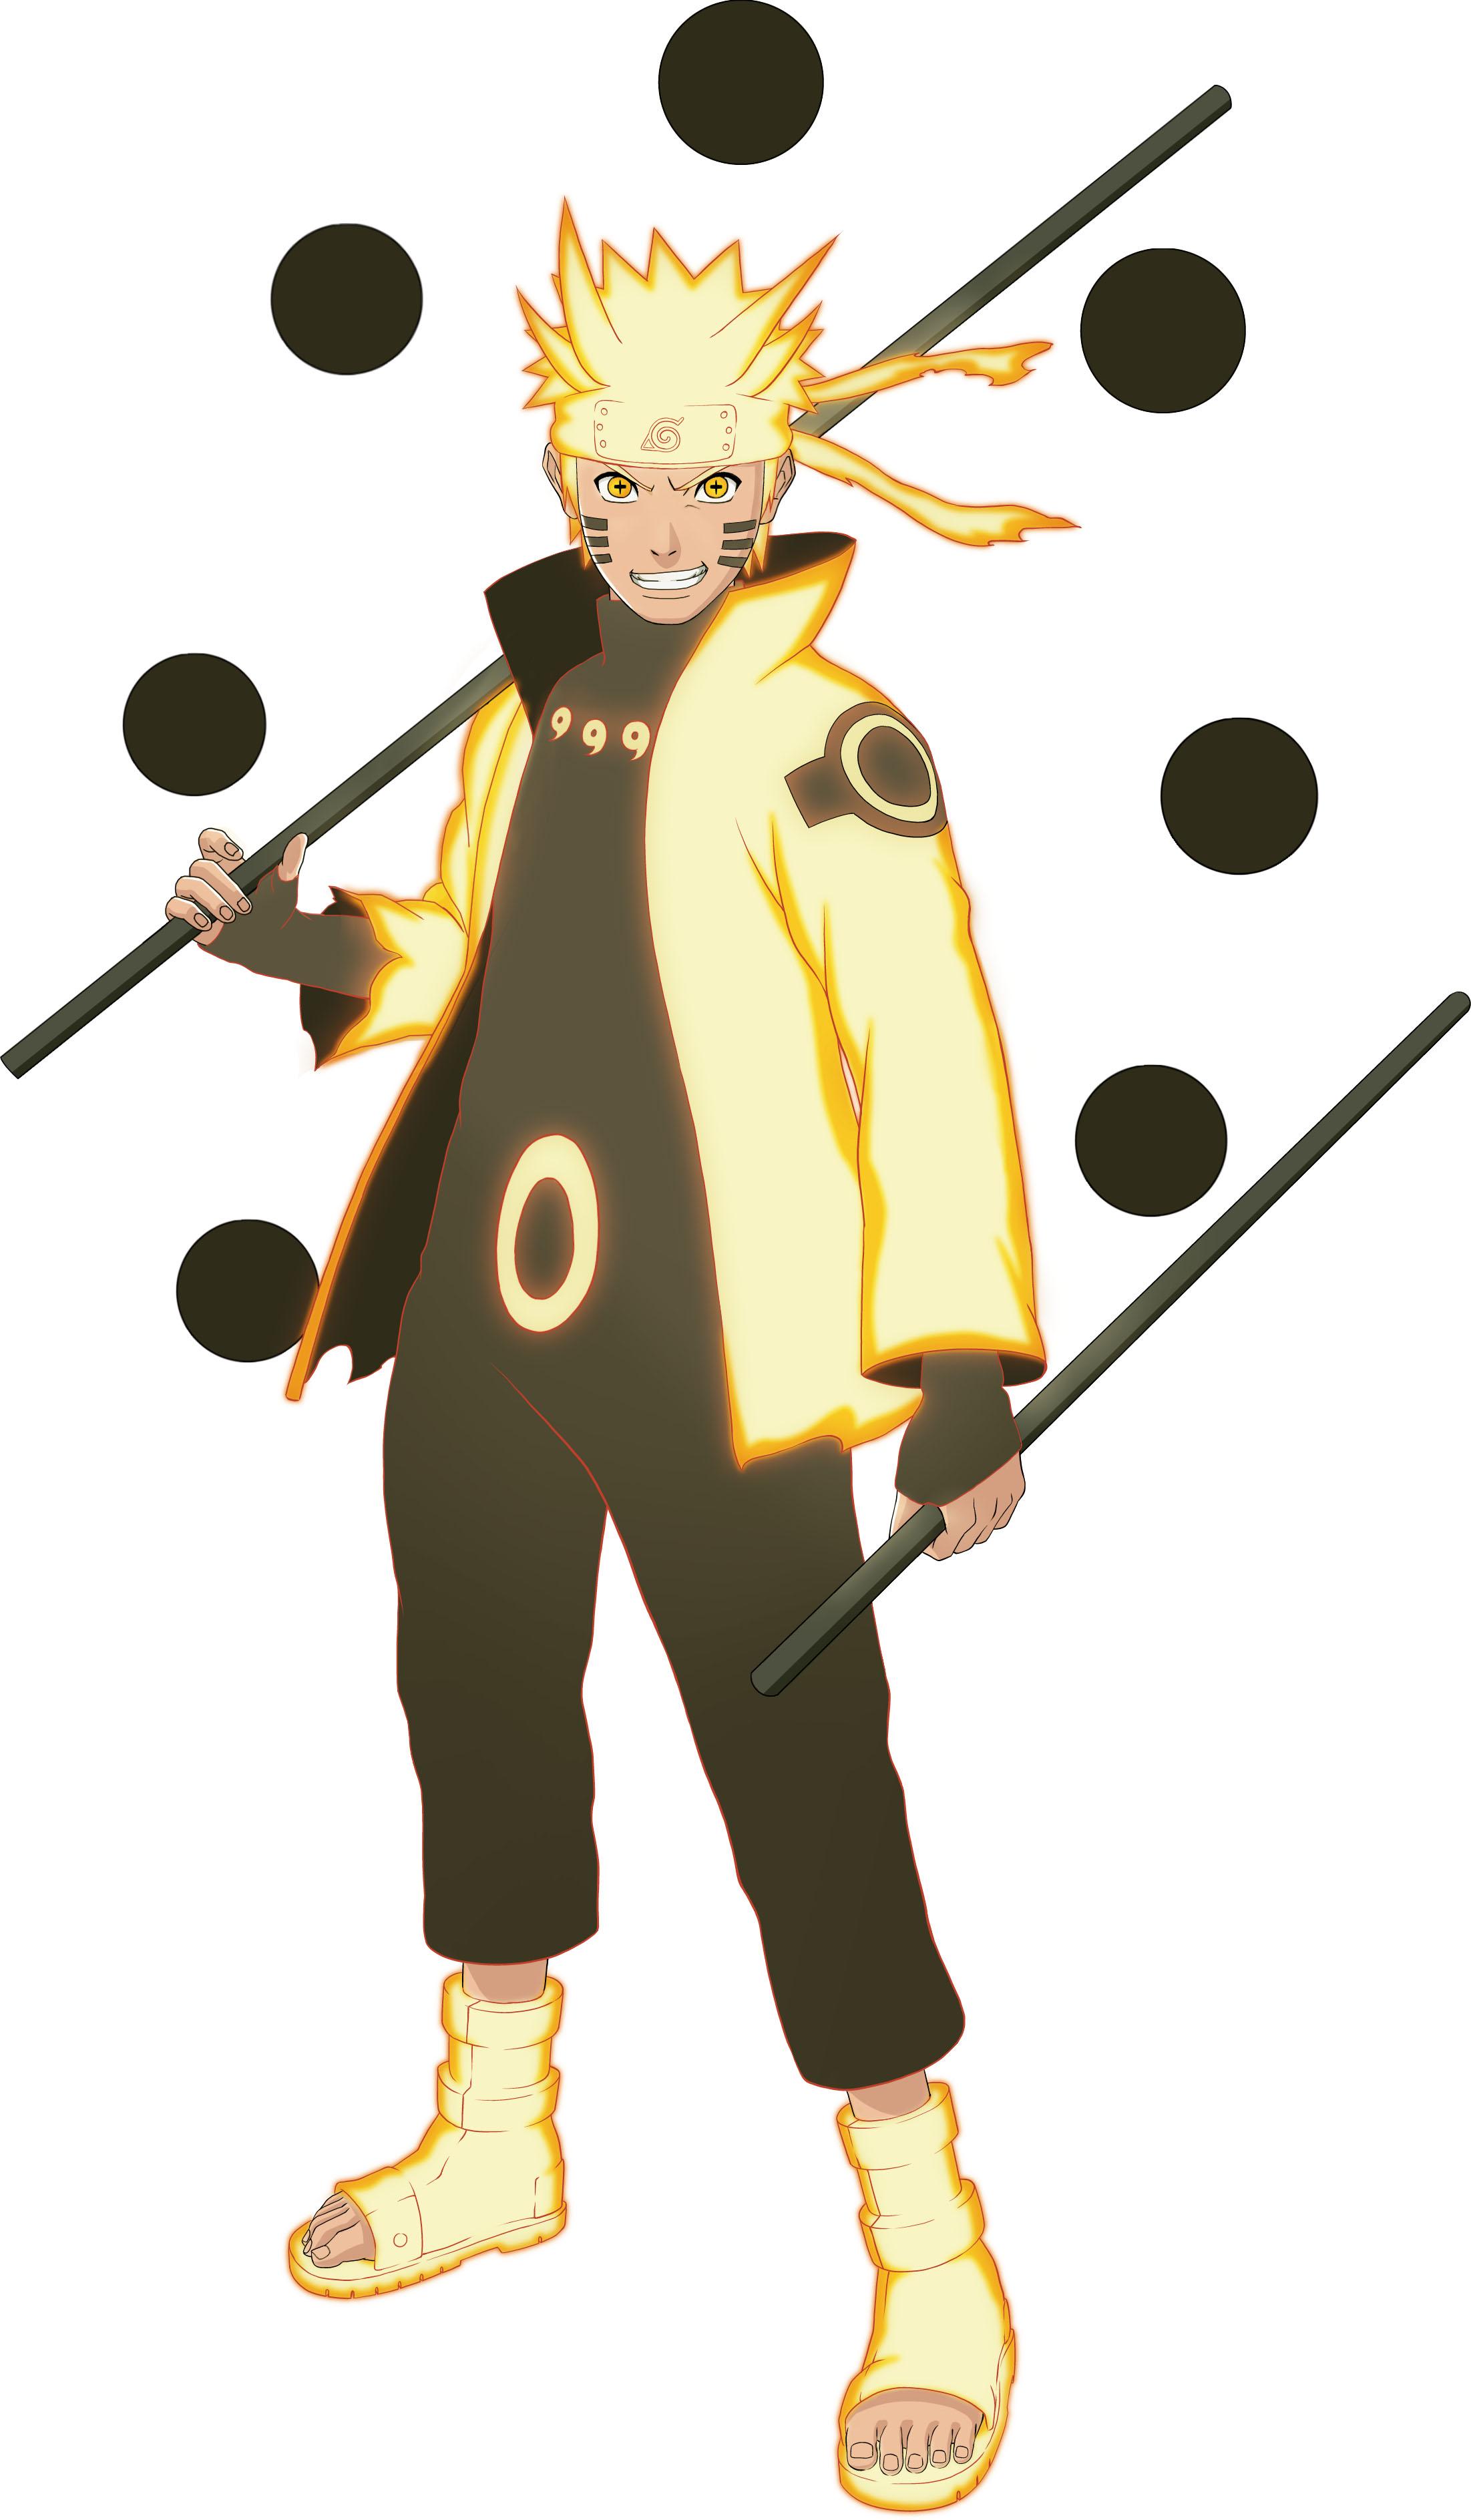 Review_NarutoShippudenUNS4_01